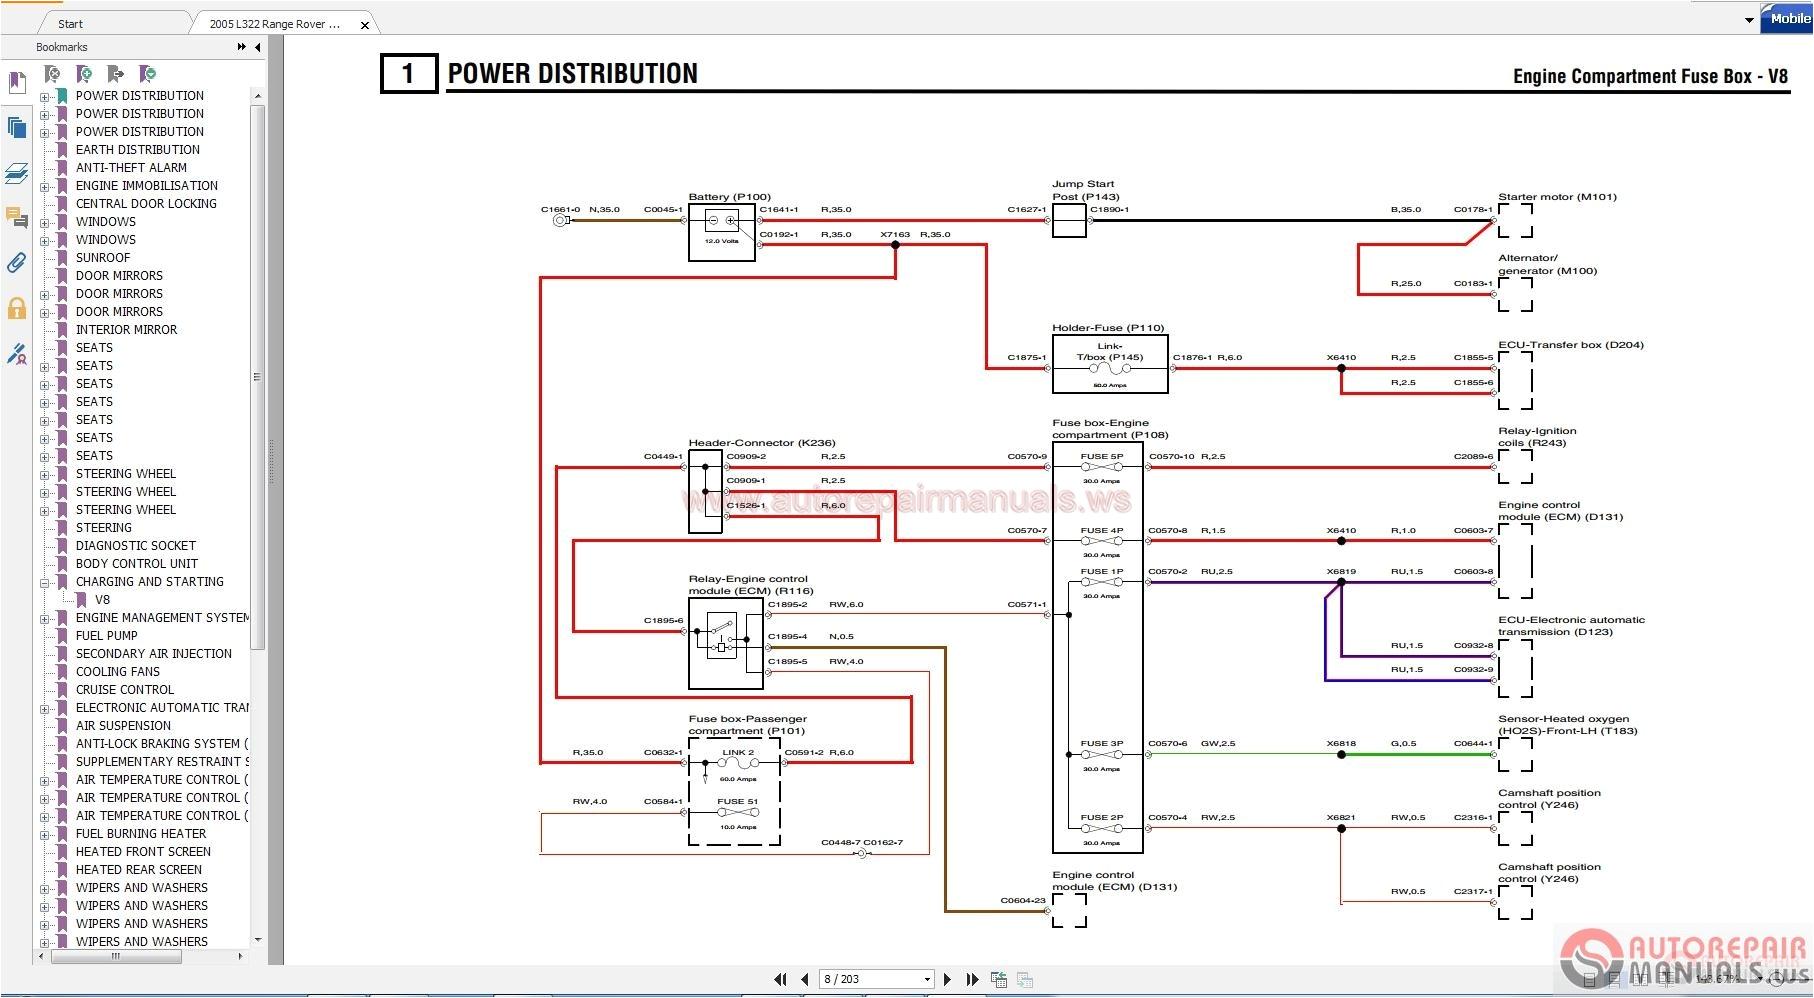 l322 audio wiring diagram wiring diagram show radio wiring harness diagram for l322